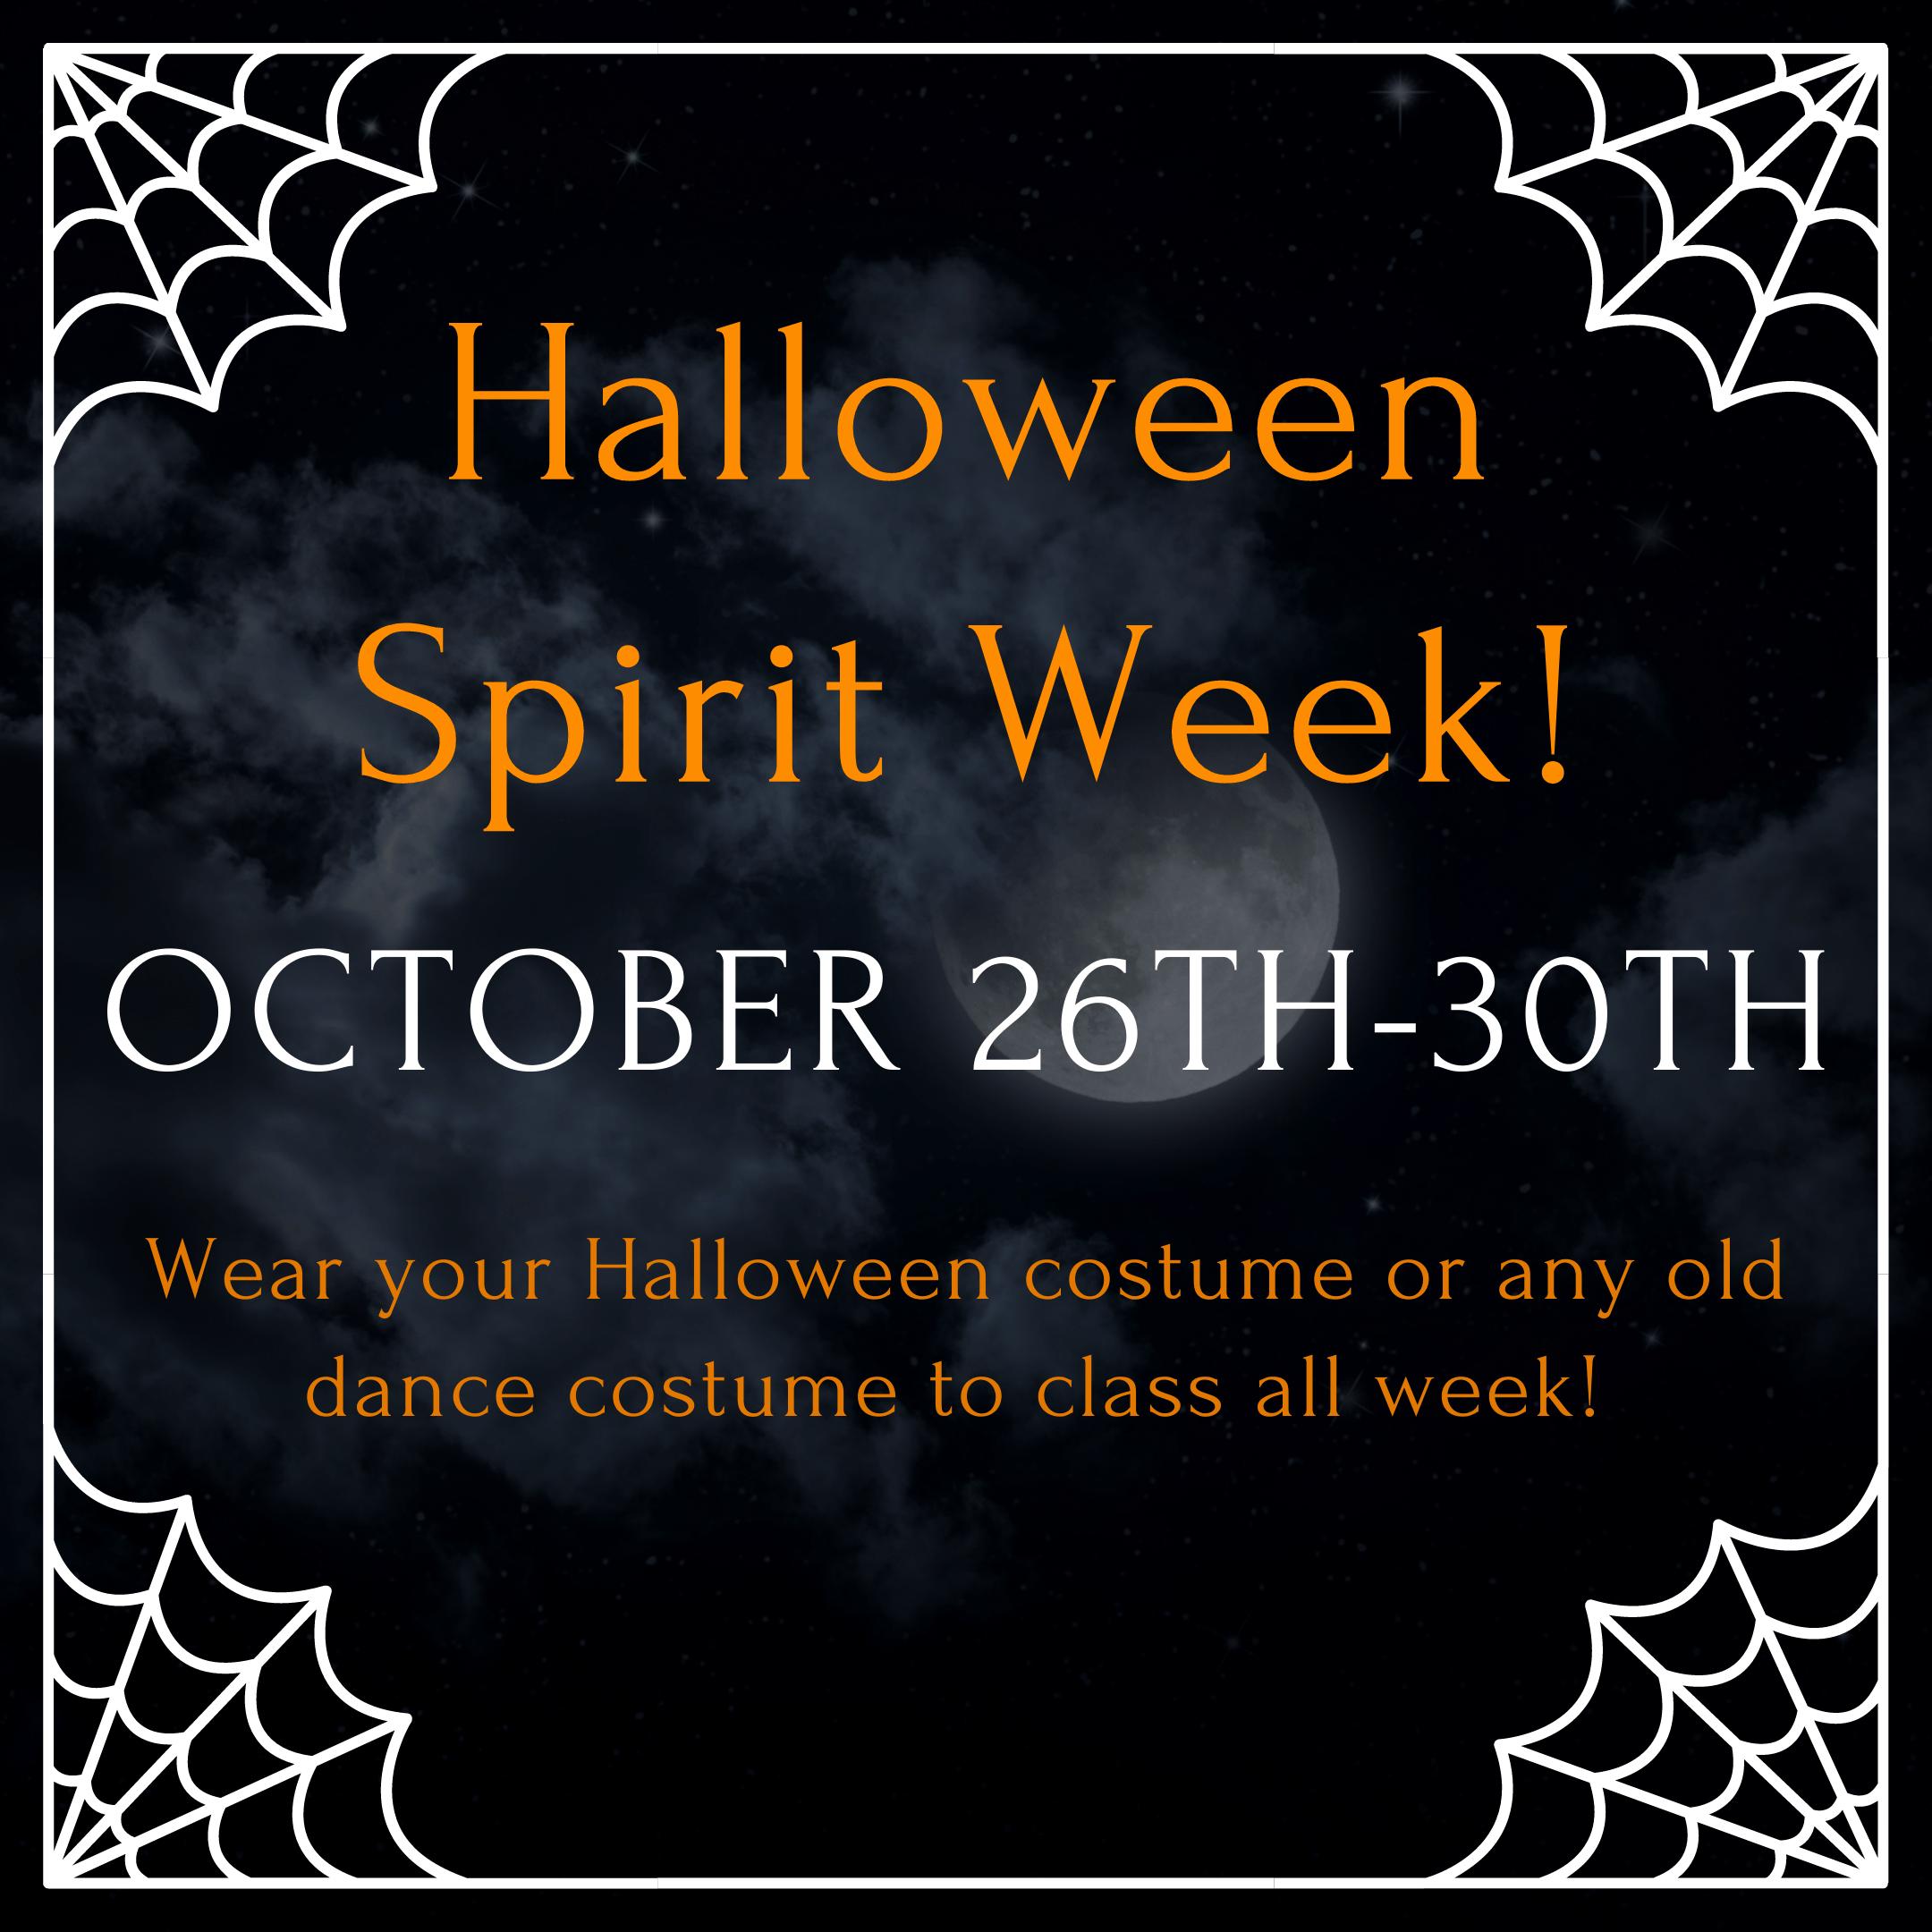 halloween spirit week.png